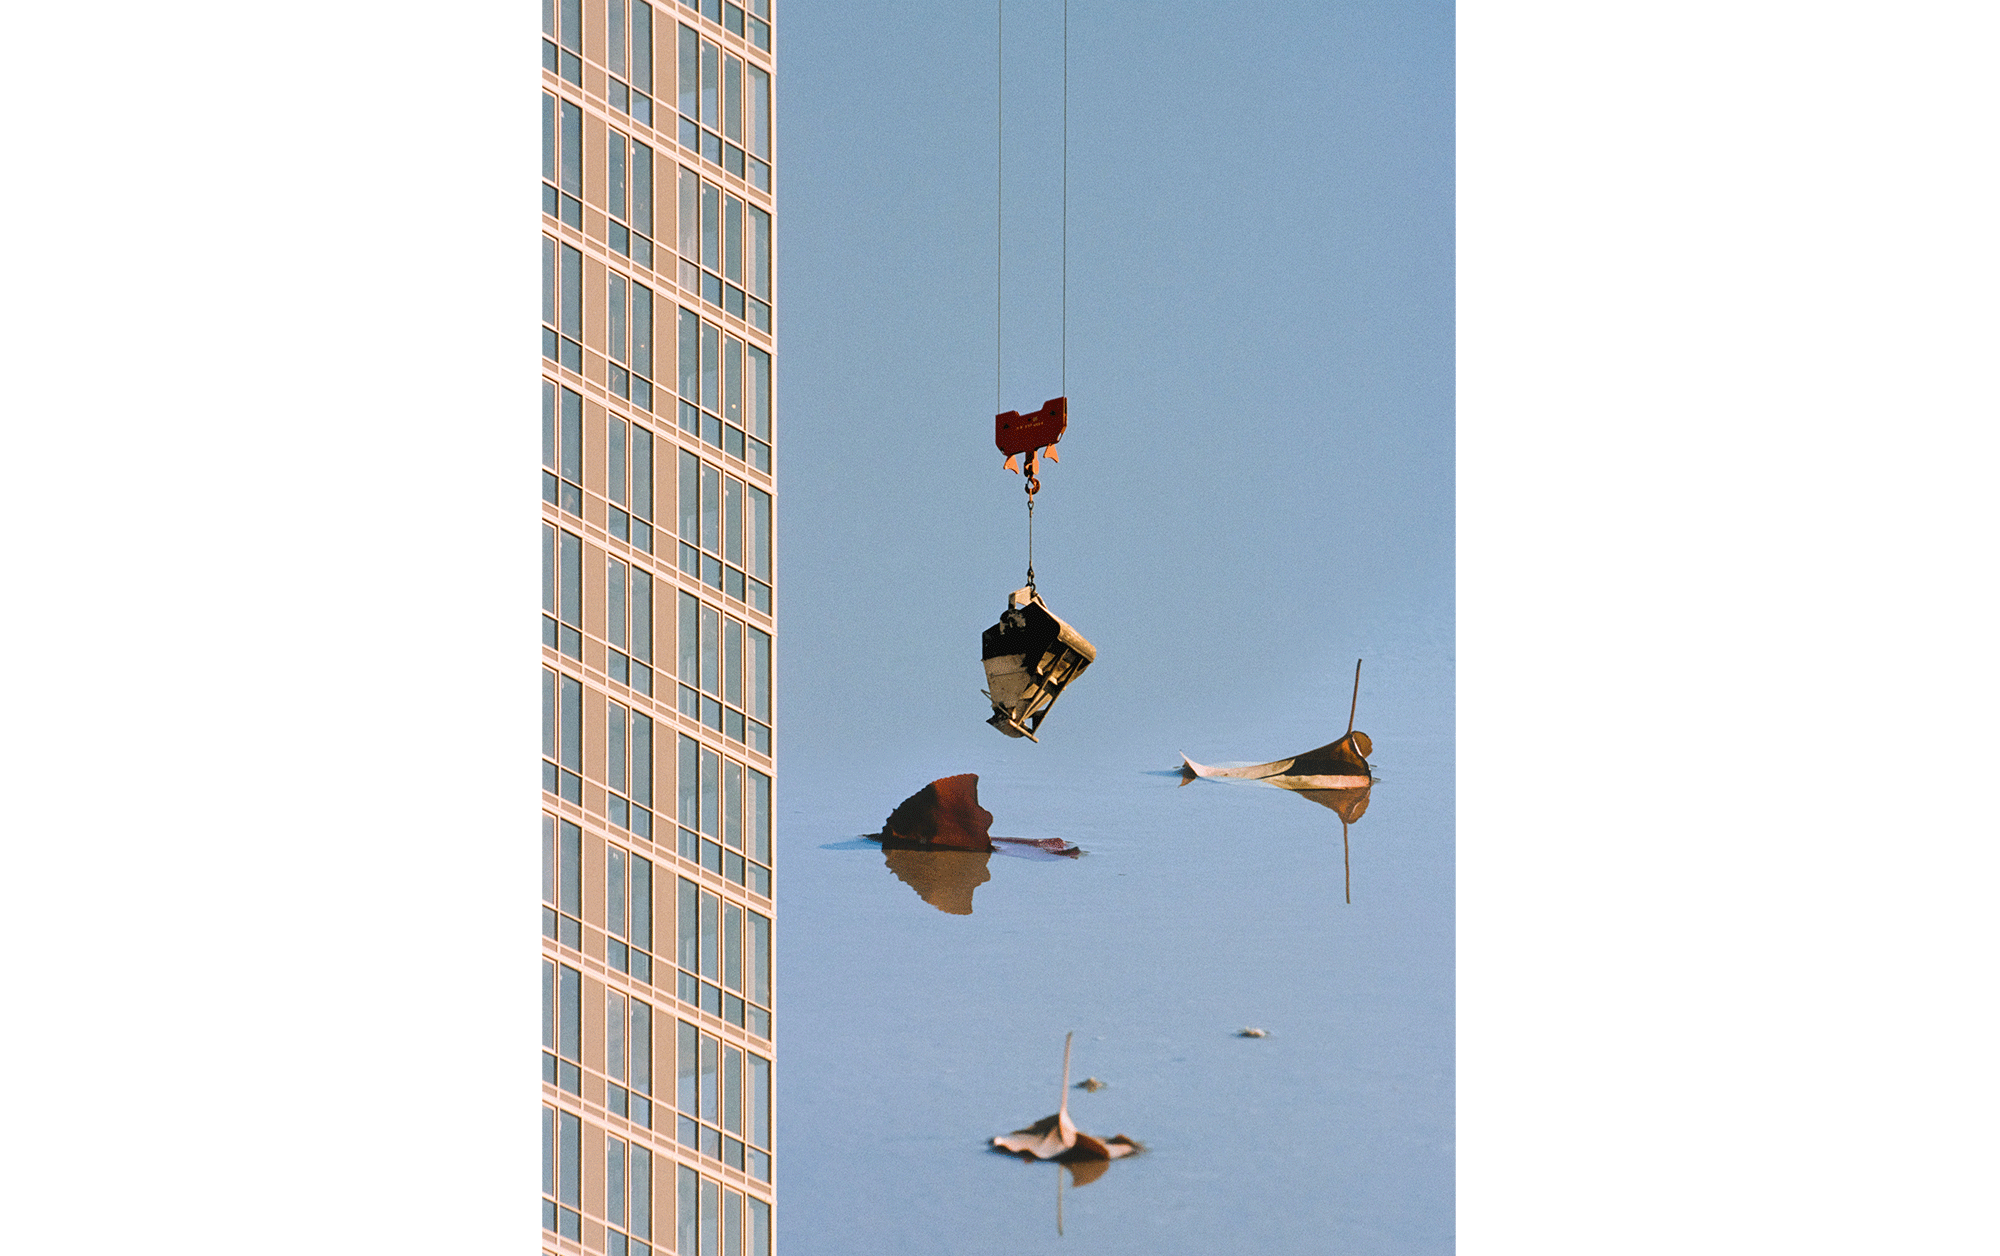 Lic 7, from the series 43 – 35 10th street, 2017 © Daniel Shea